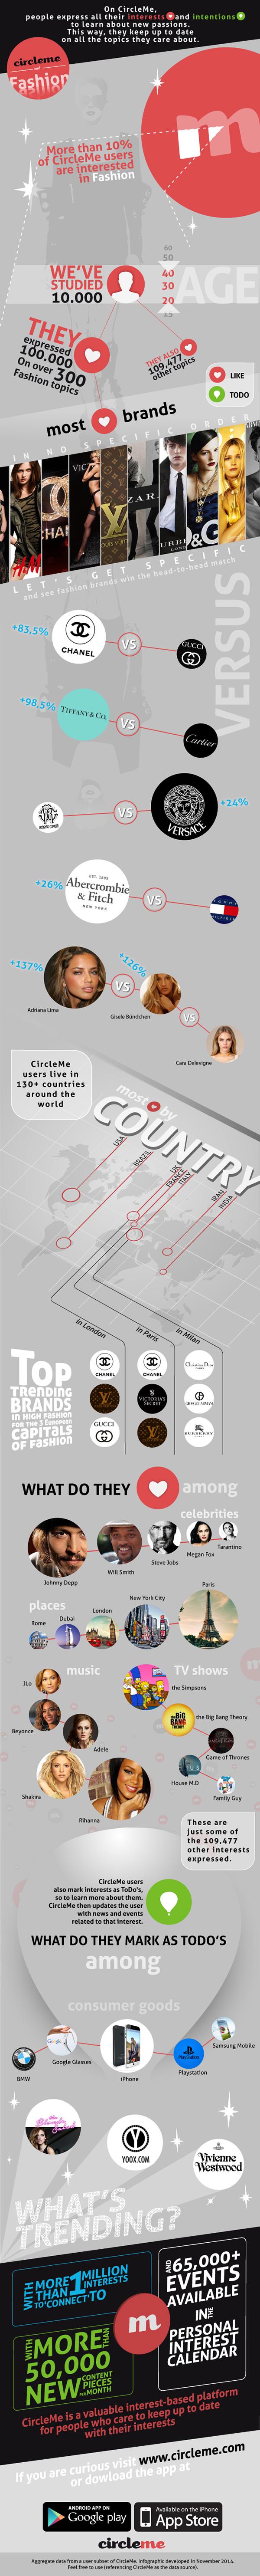 infographic_circleme